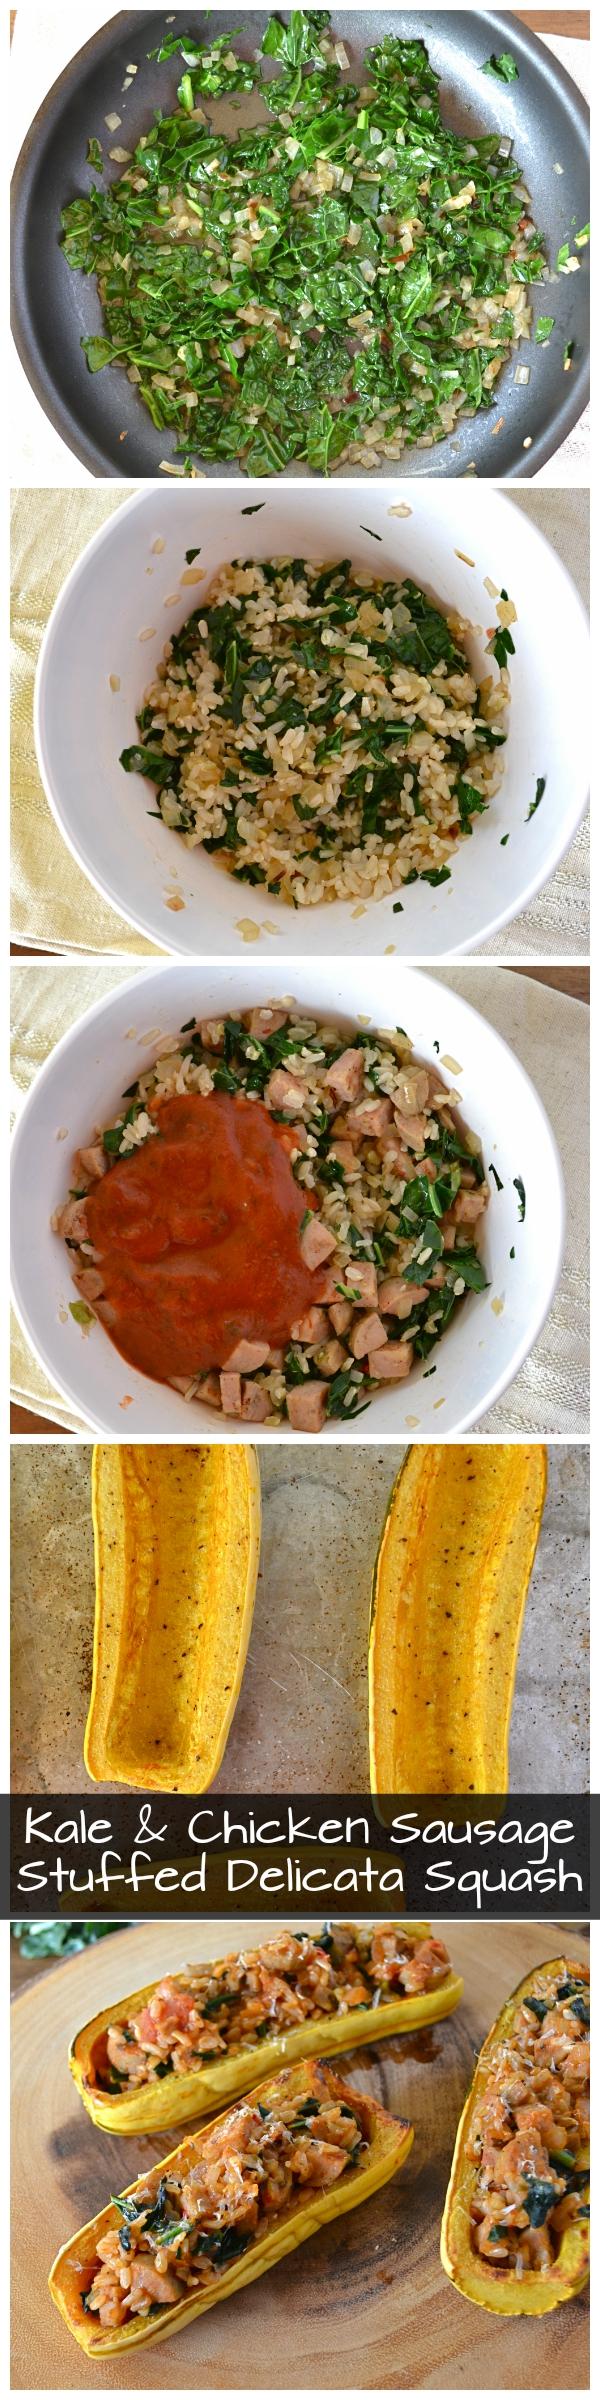 Kale & Chicken Sausage Stuffed Delicata Squash - Little Bits of...